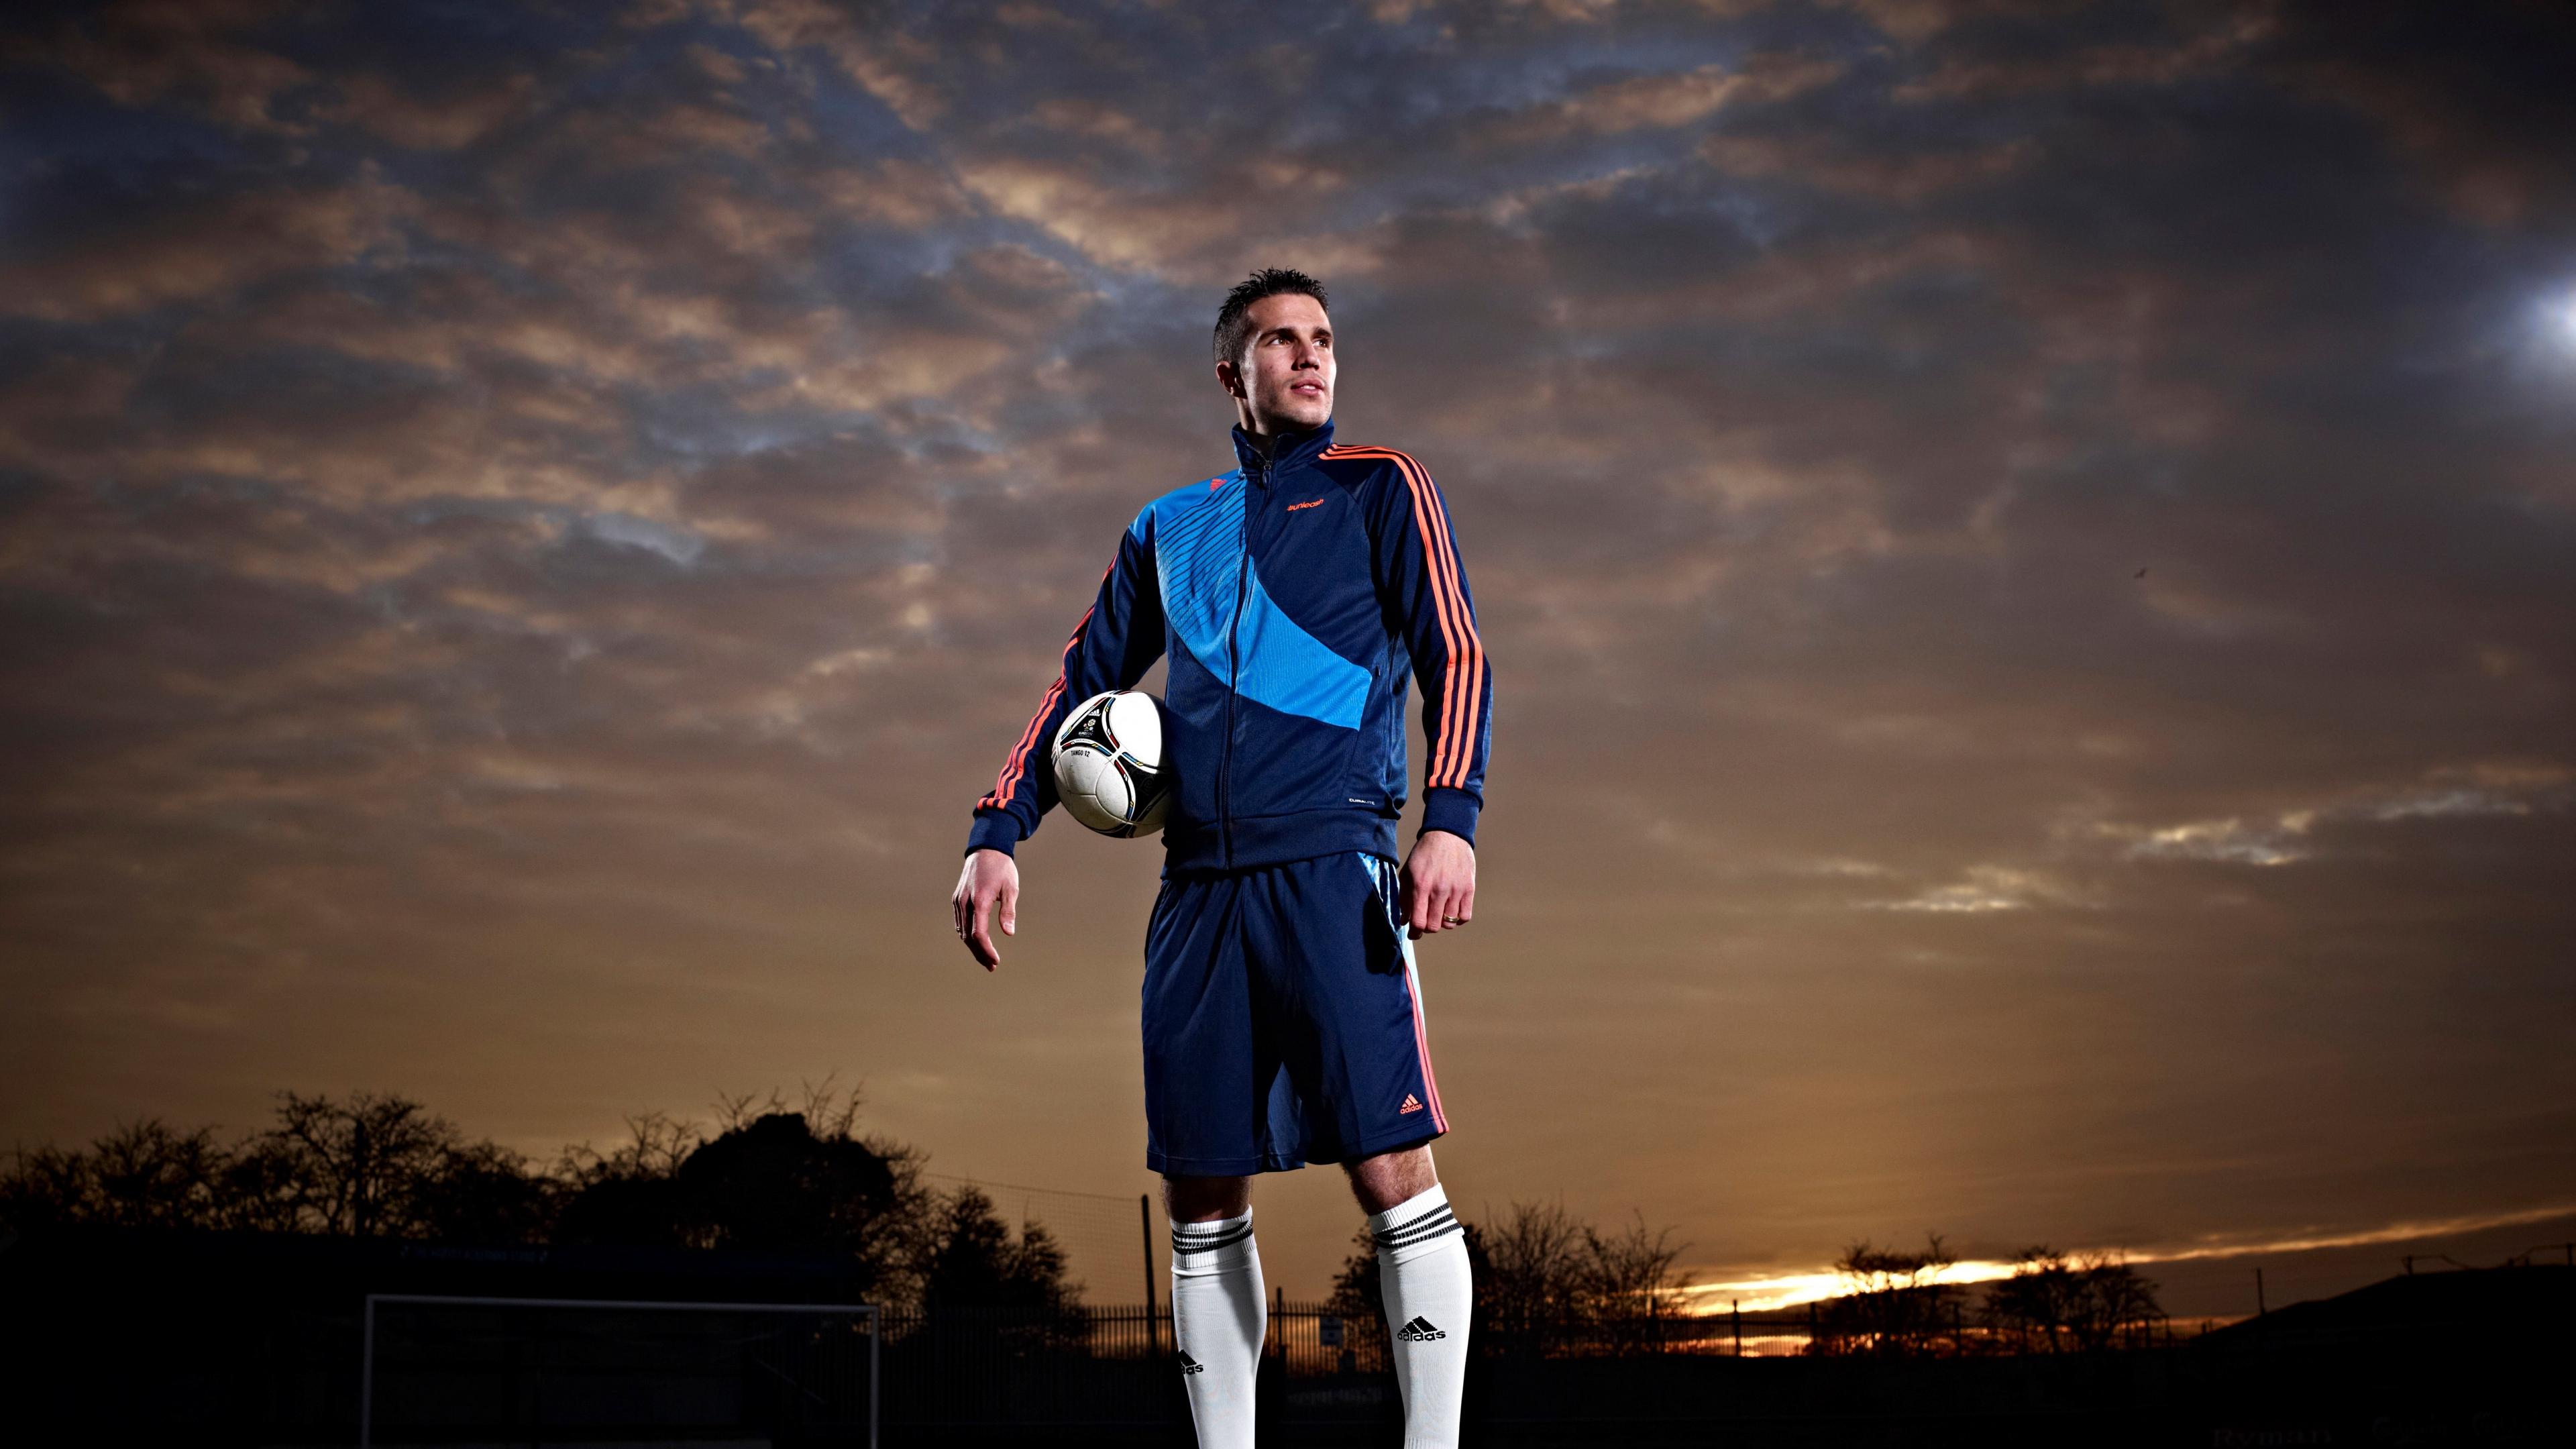 robin van persie manchester united footballer 4k 1540062552 - robin van persie, manchester united, footballer 4k - robin van persie, manchester united, footballer